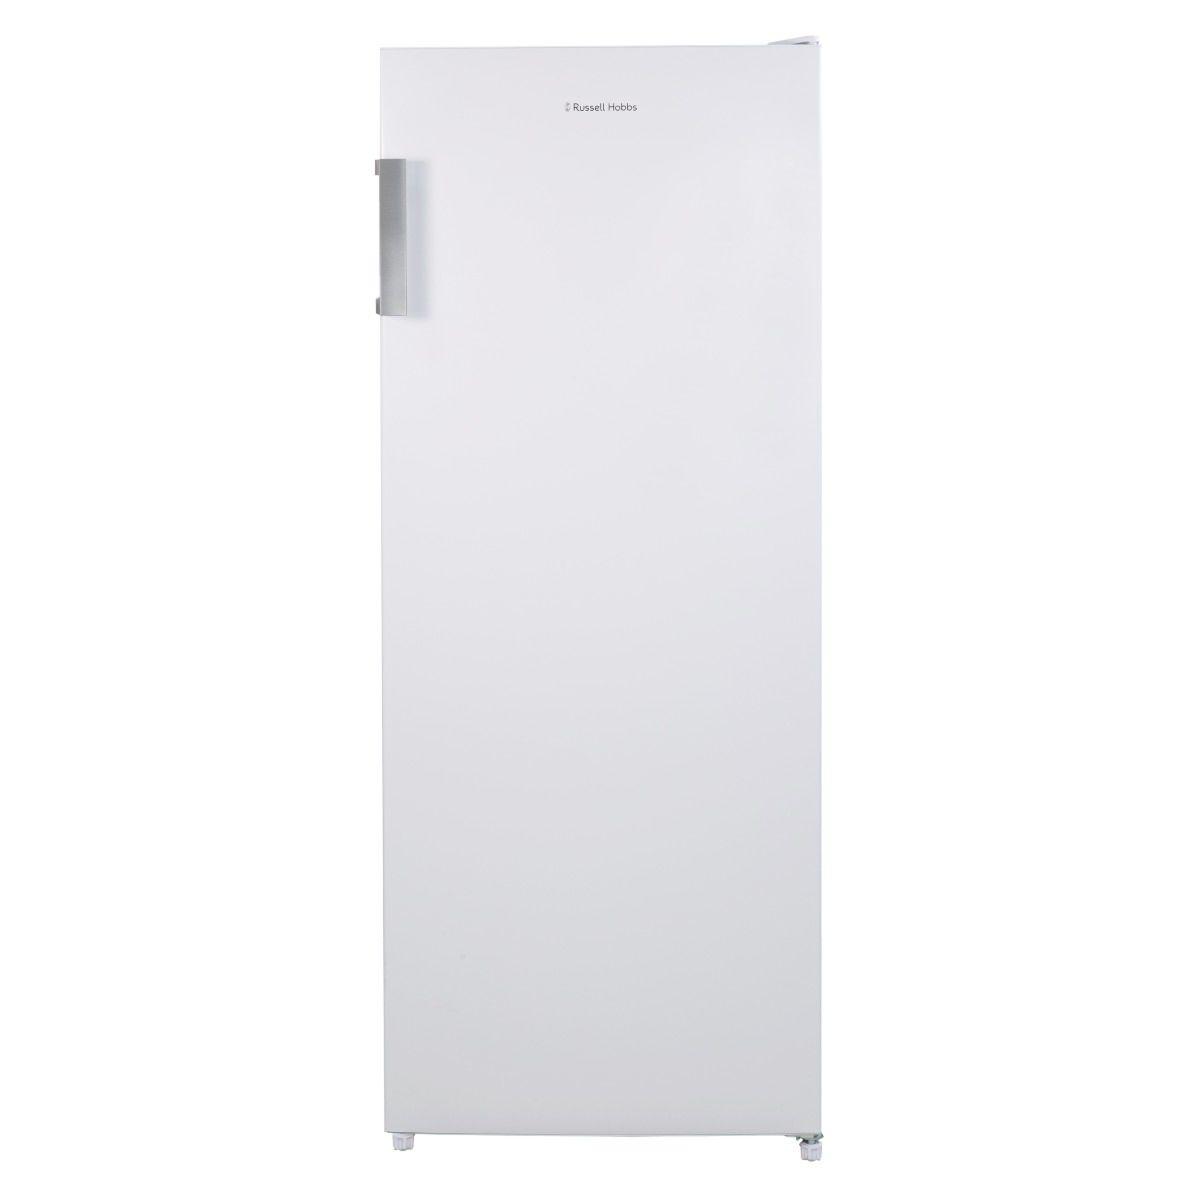 Russell Hobbs RH54FR3FZ144 54cm Wide 144cm High Frost Free Freezer - White